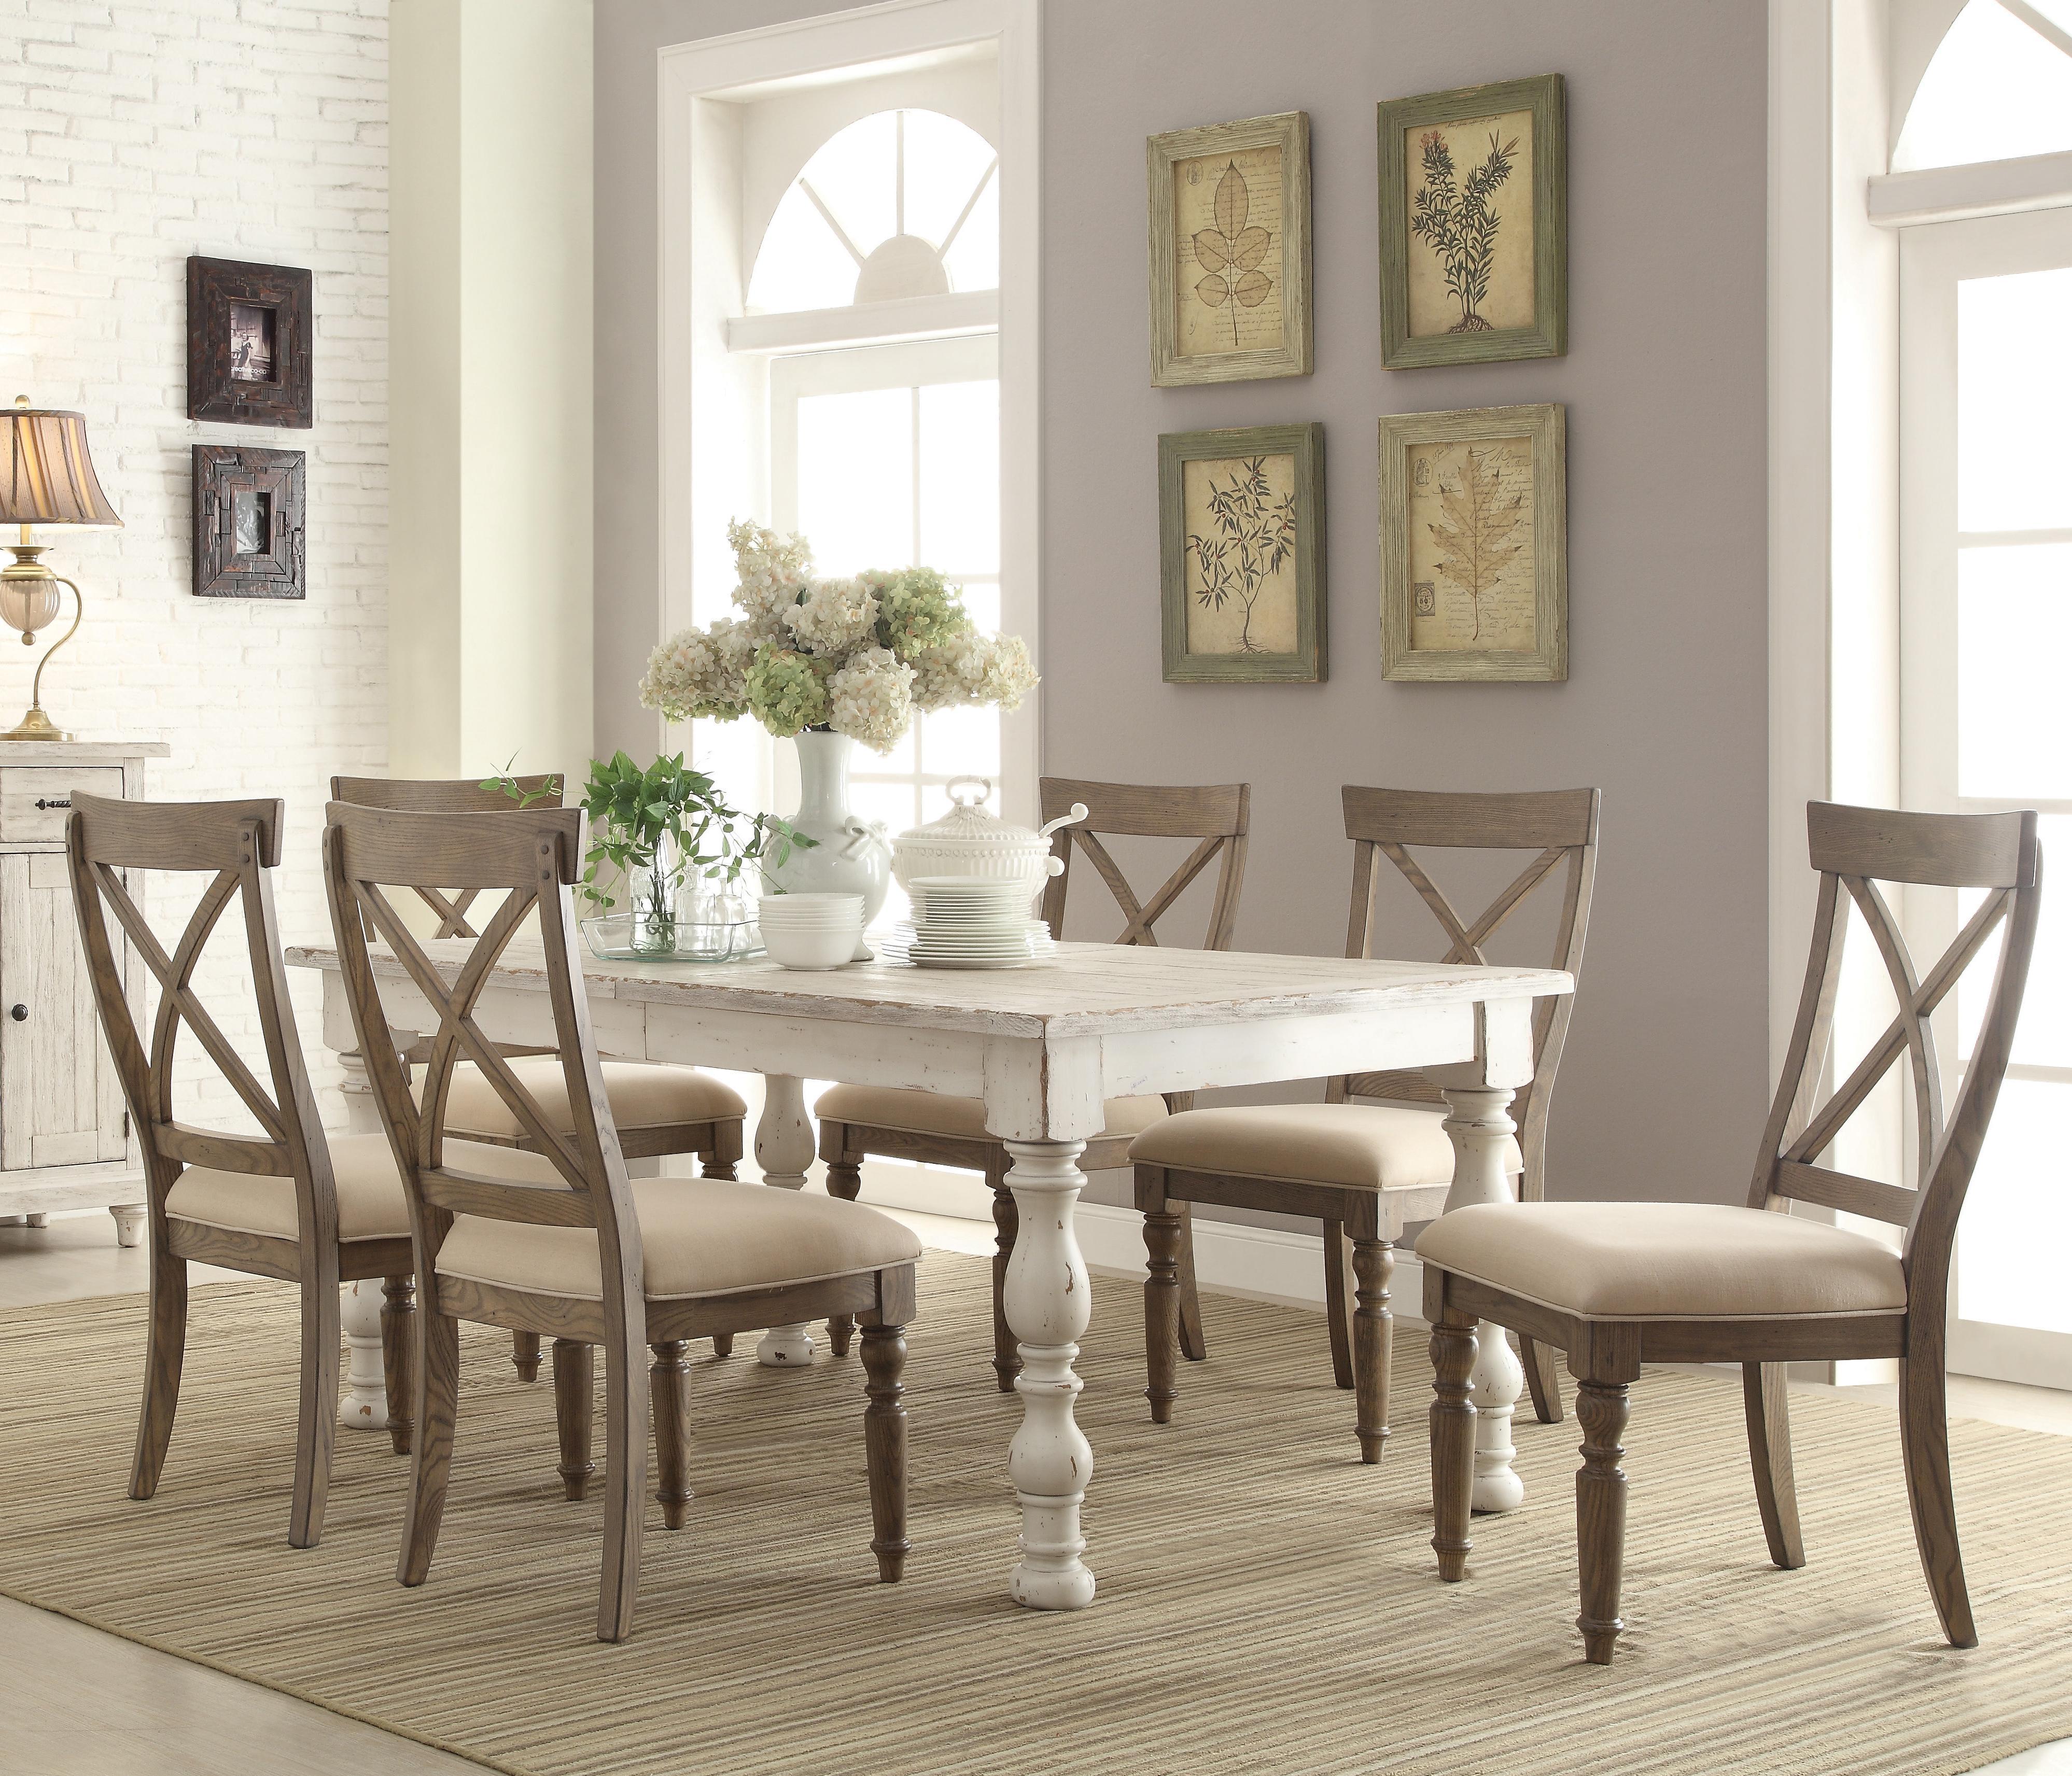 riverside furniture aberdeen 7 piece farmhouse dining set value city furniture dining 7 or. Black Bedroom Furniture Sets. Home Design Ideas